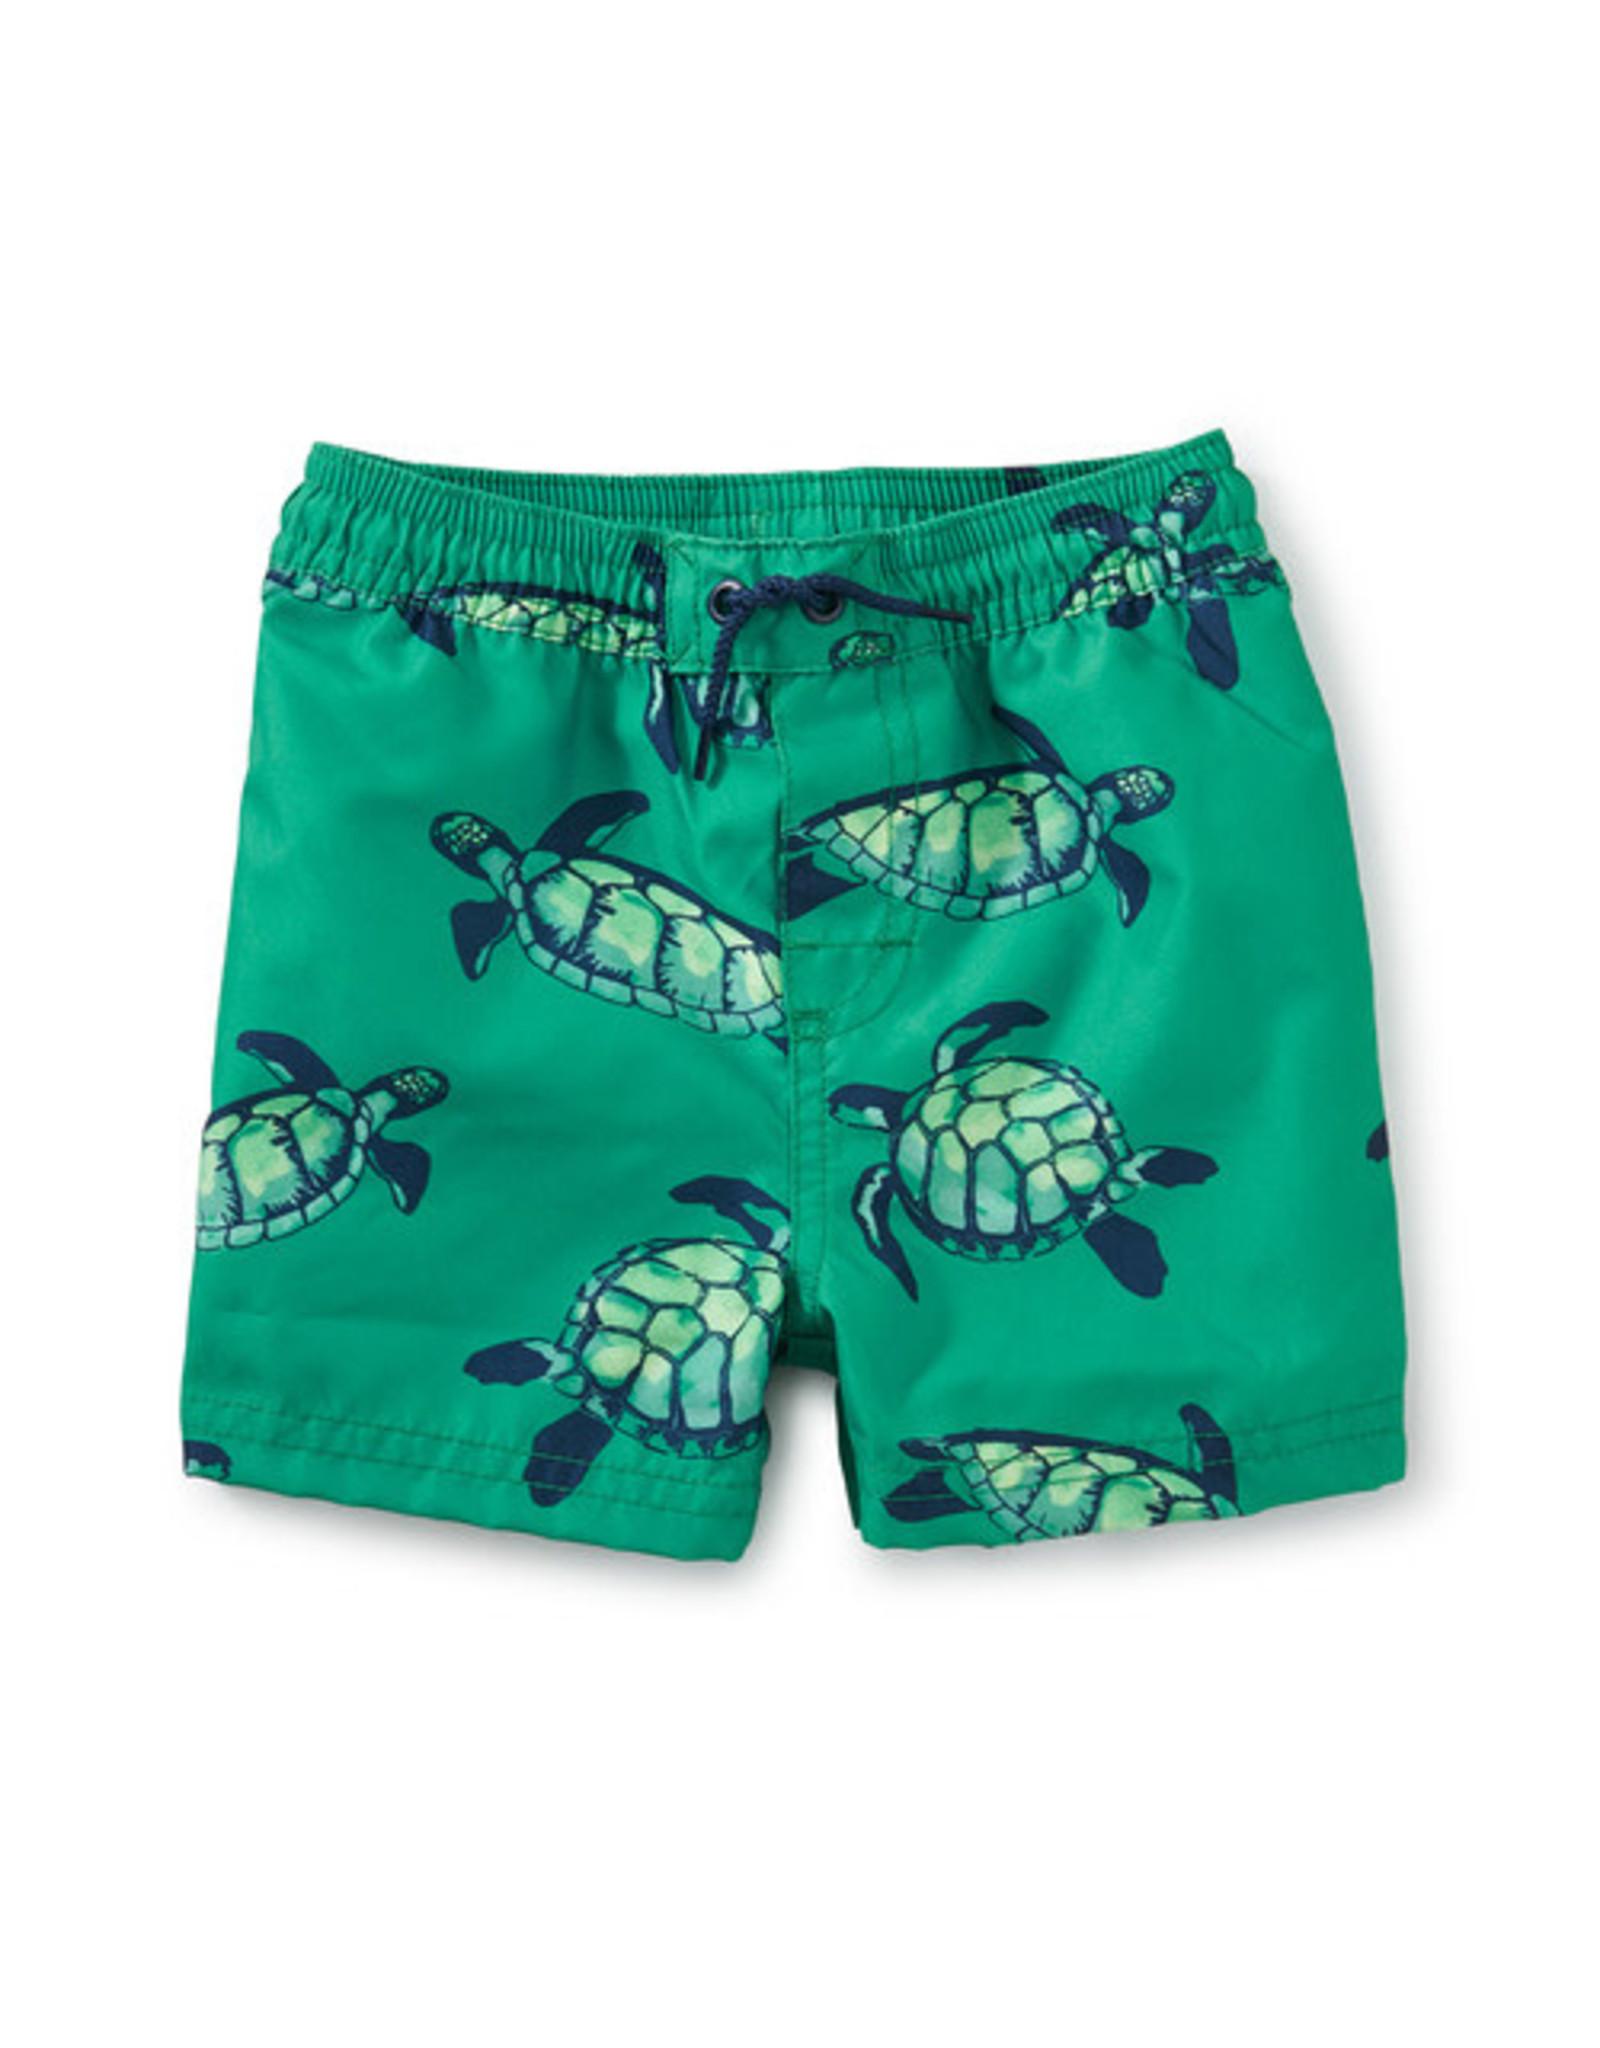 Tea Full Length Baby Swim Trunks, Sea Turtles